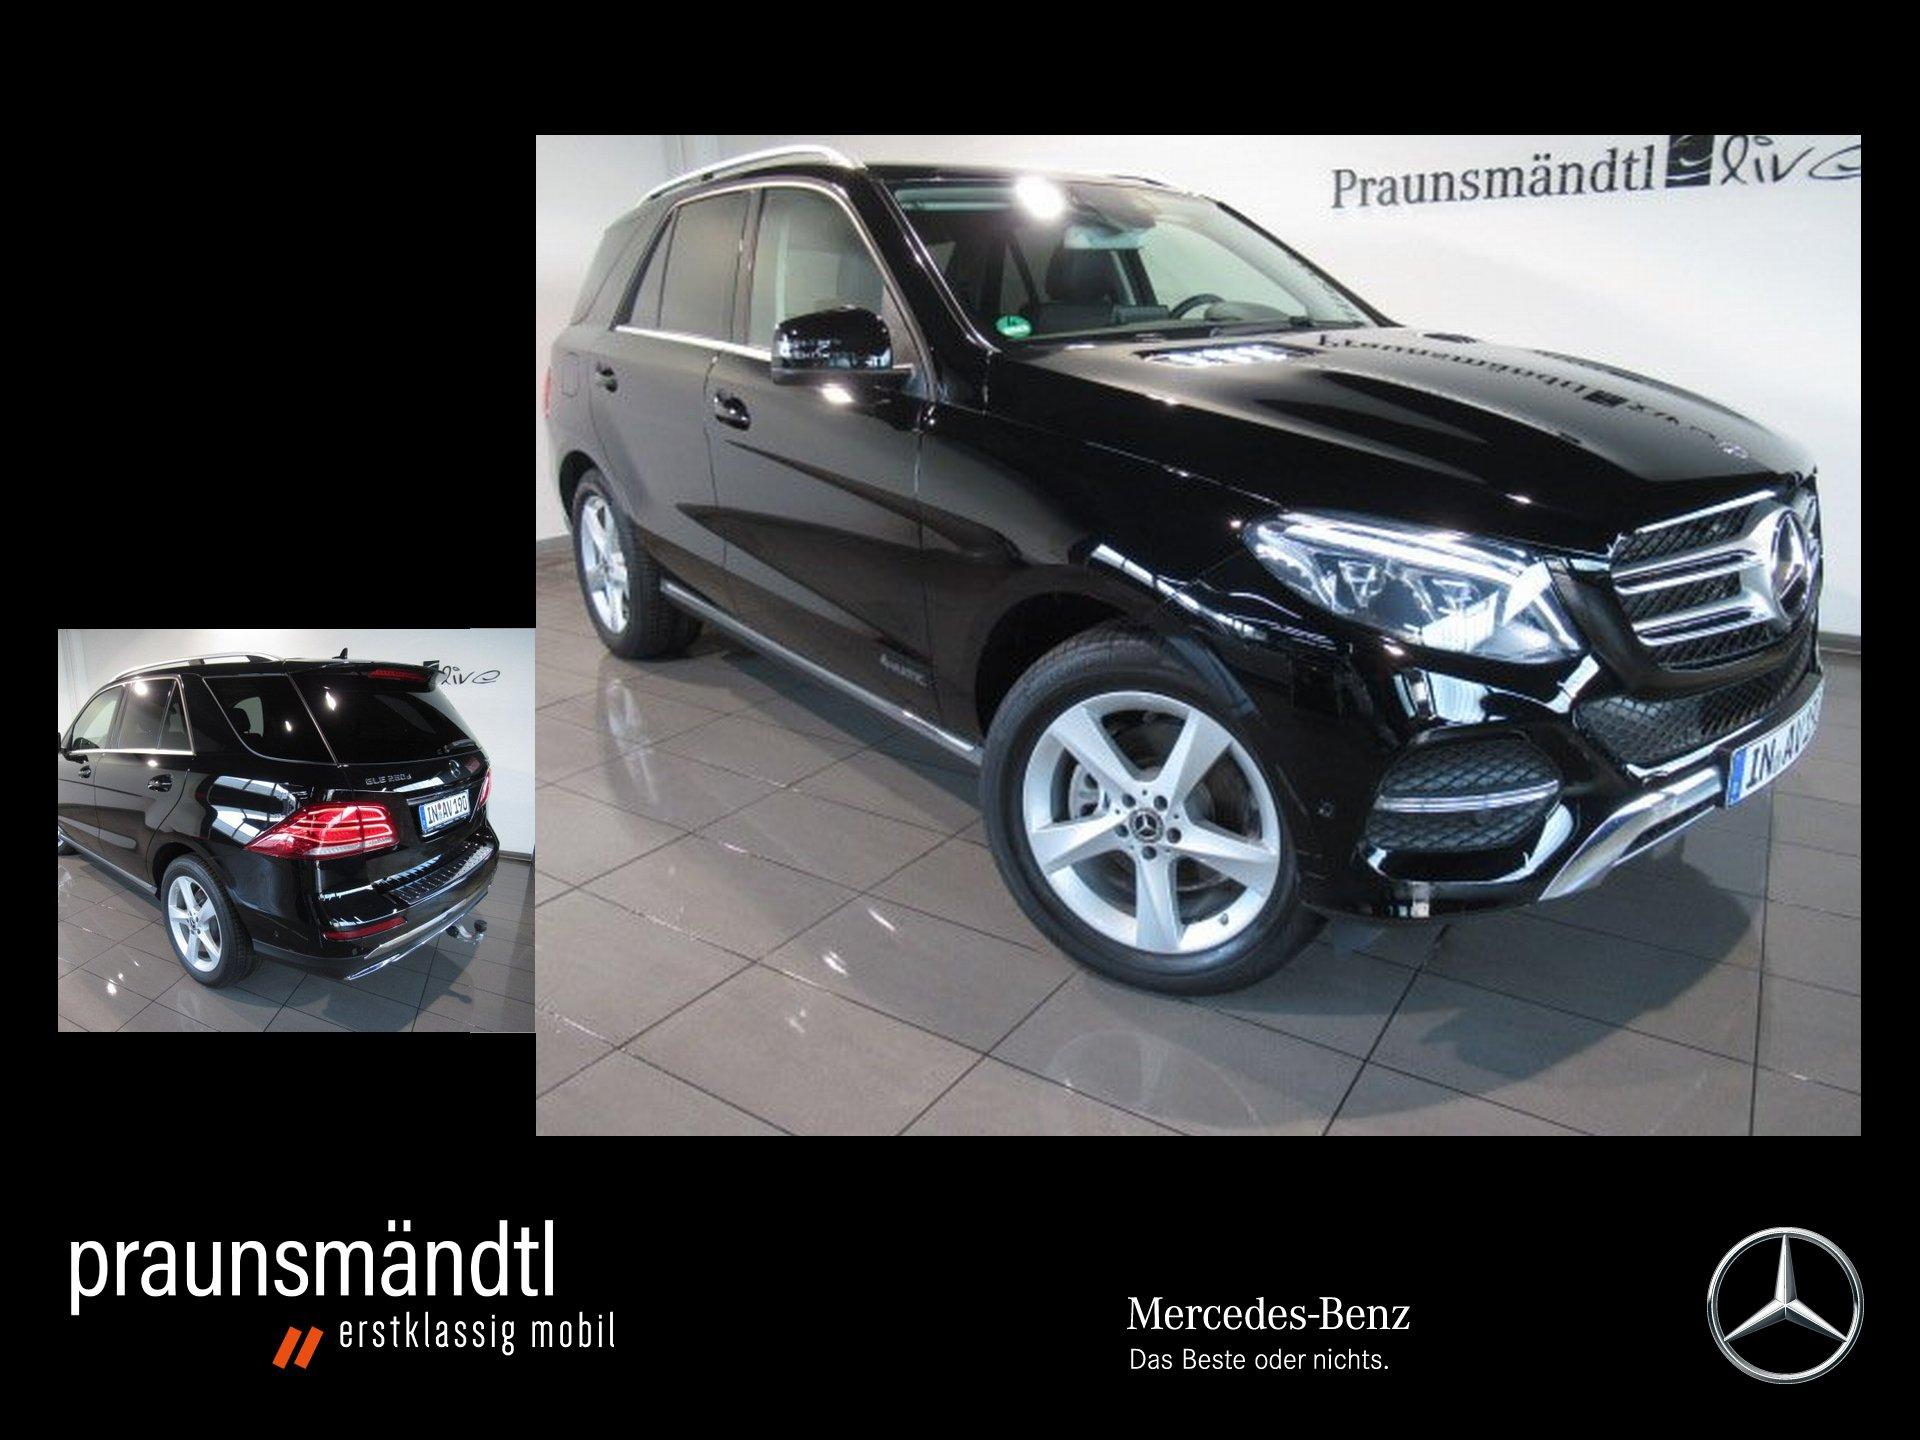 Mercedes-Benz GLE 250 d 4M Memory/St.-Hzg/SHD/AHK/AIRMATIC/ILS, Jahr 2017, Diesel